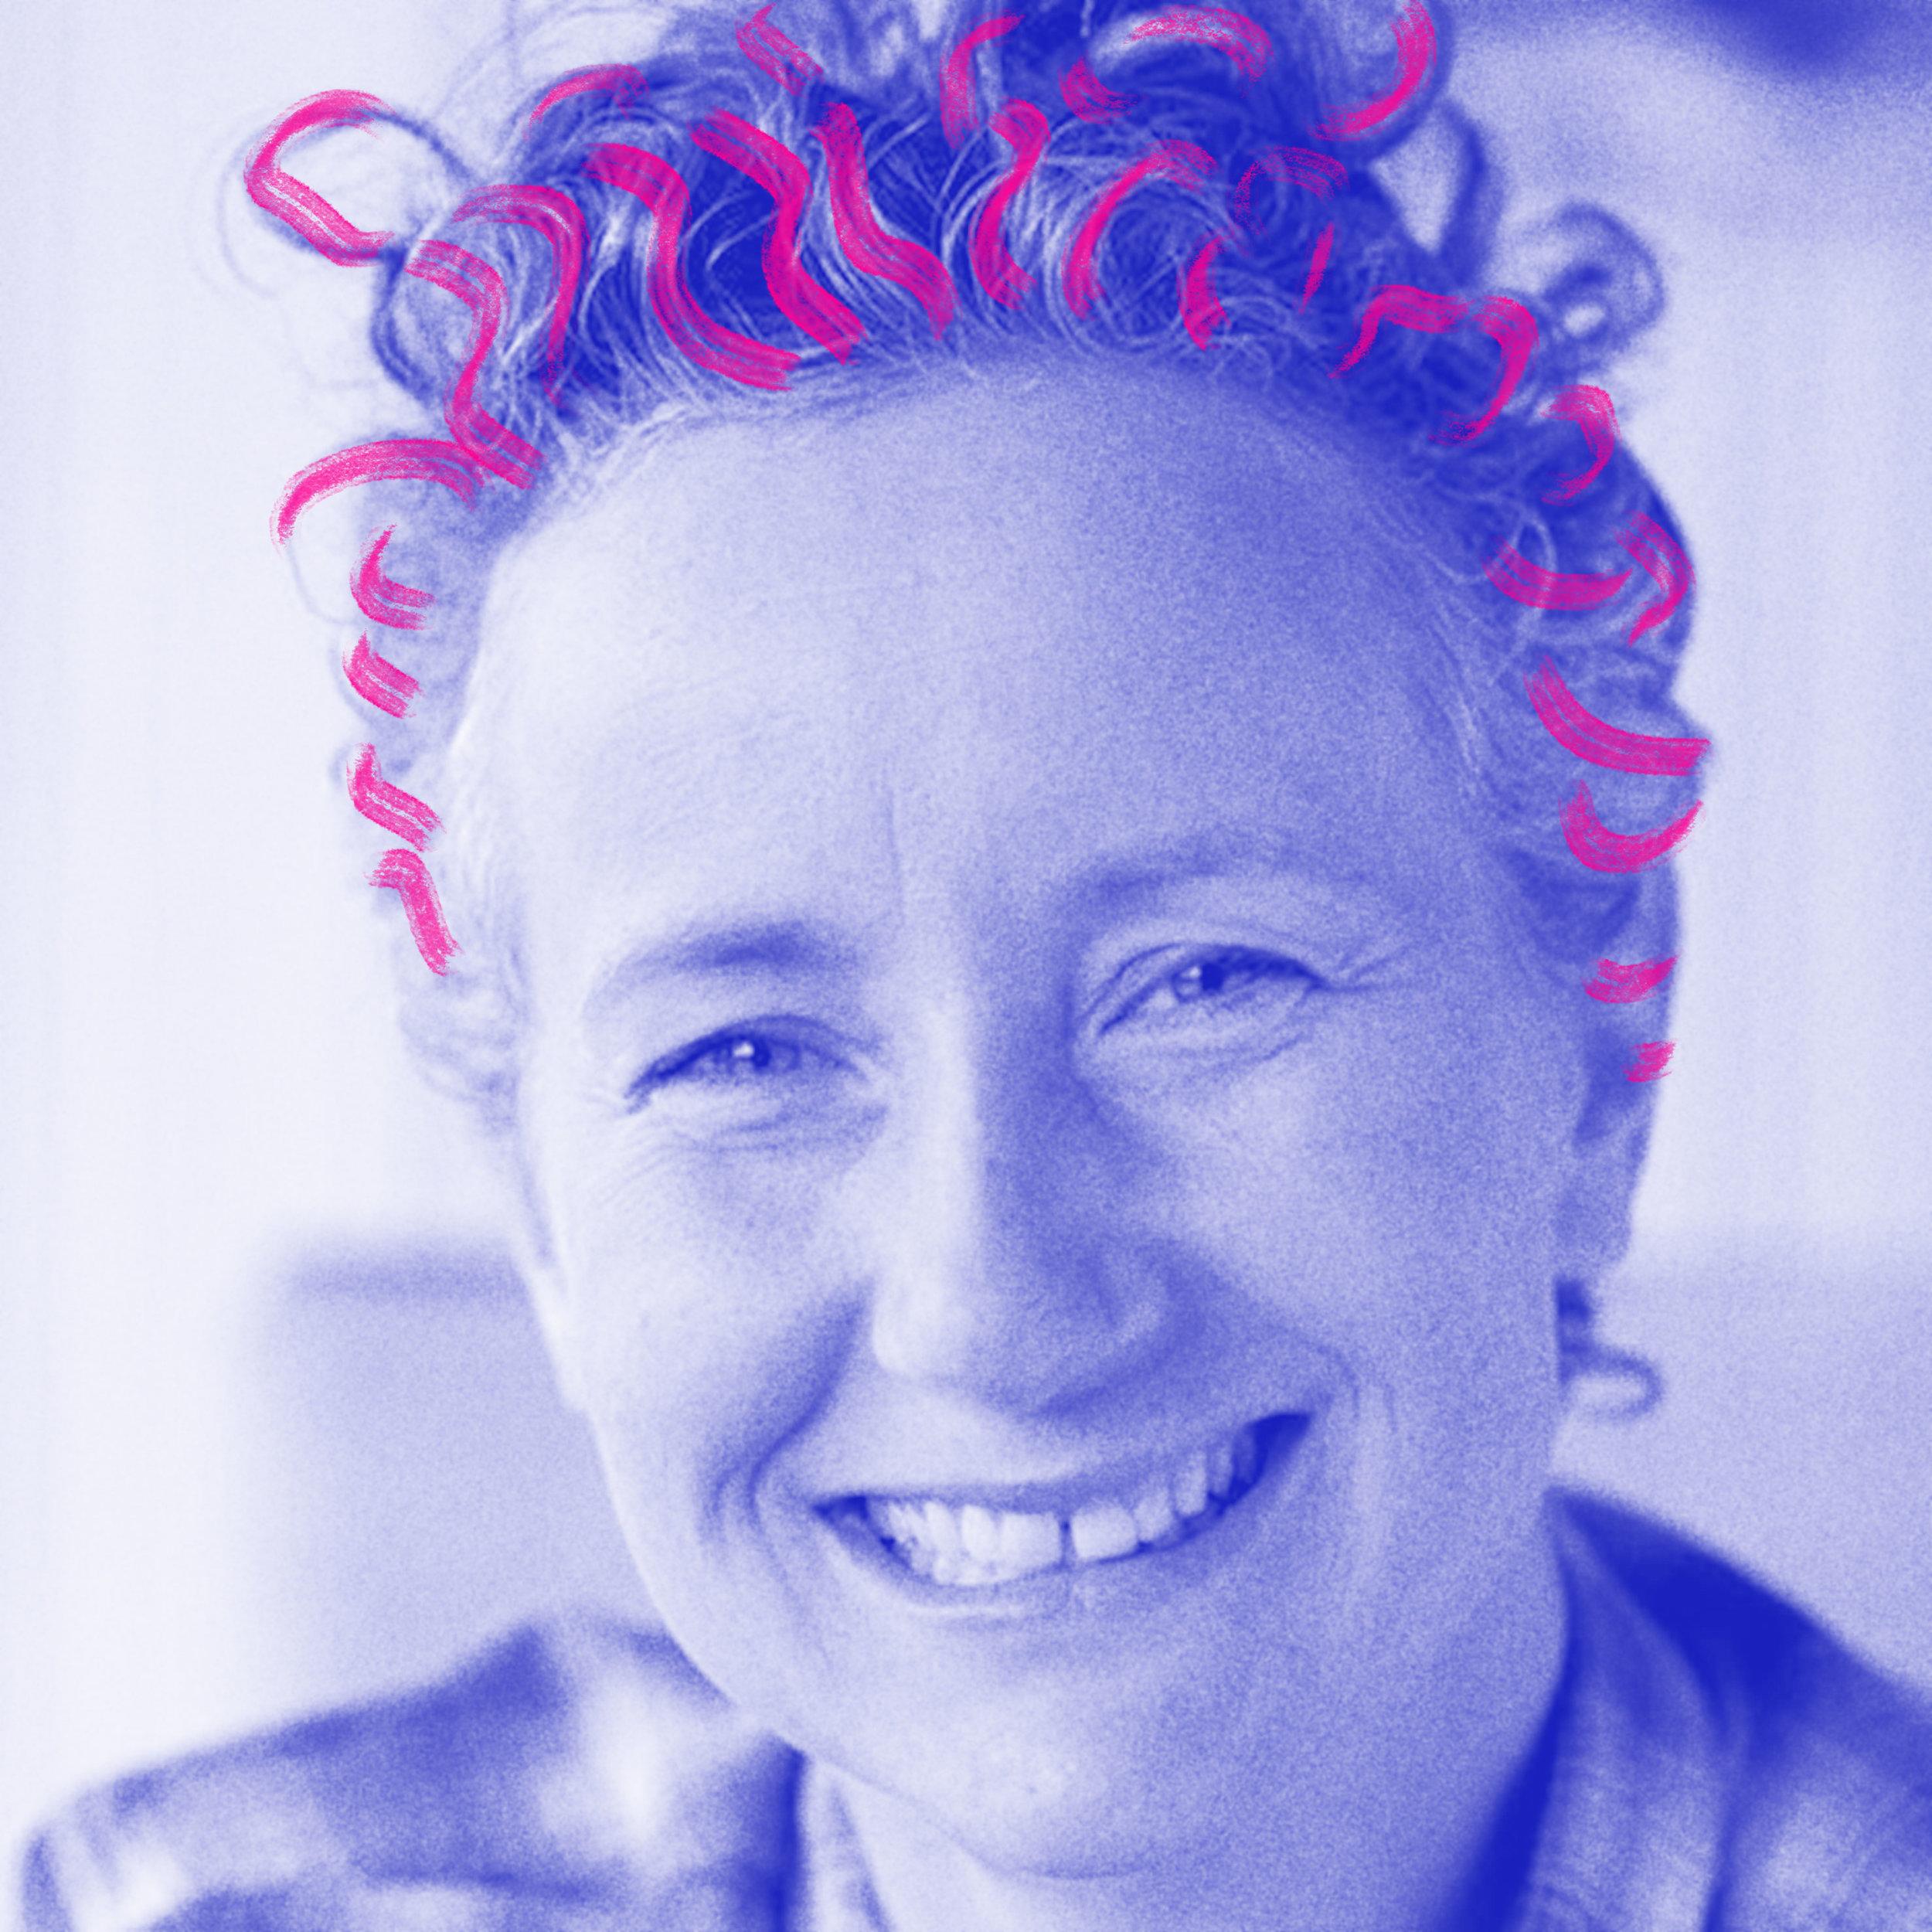 Julie-Forchammer-blue.jpg